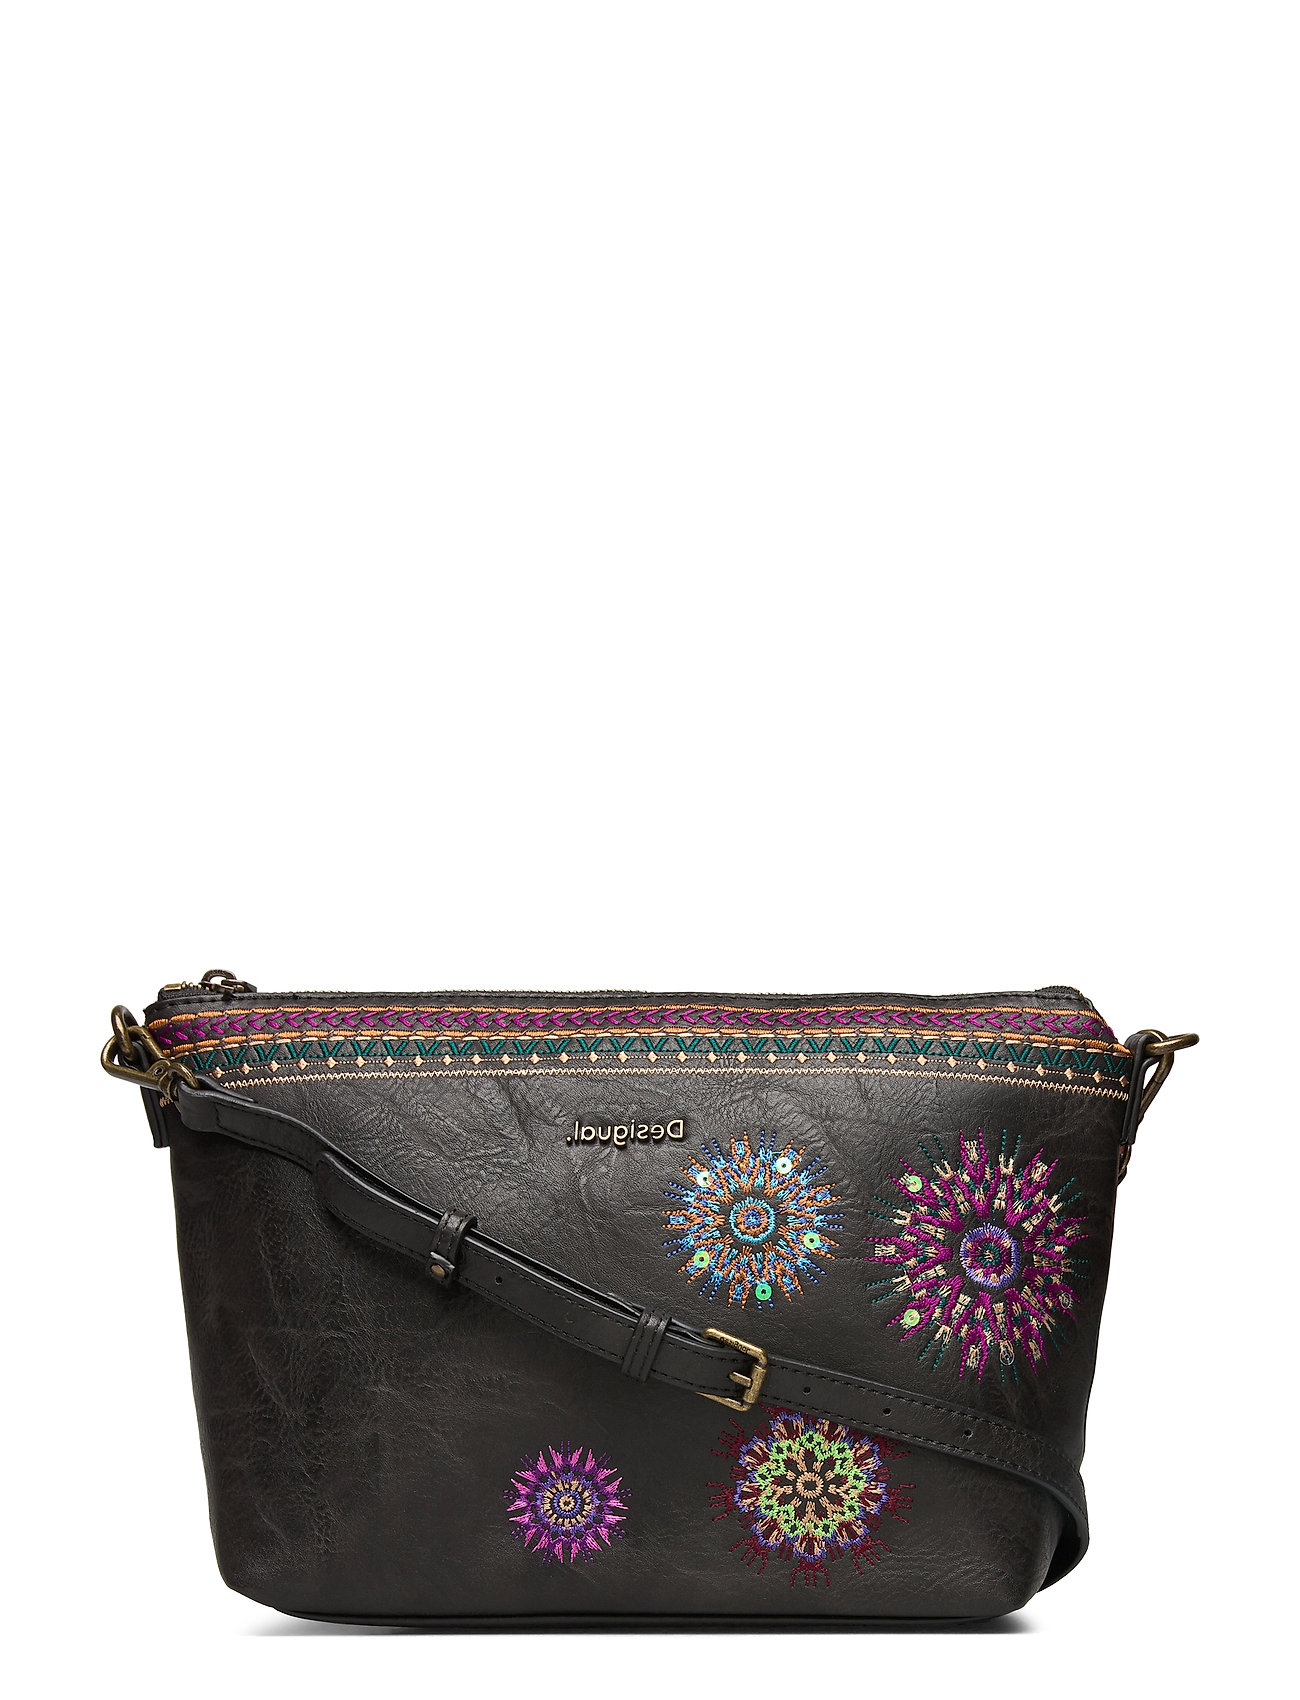 Image of Bols Astoria Cata Bags Small Shoulder Bags - Crossbody Bags Grøn Desigual Accessories (3452230275)